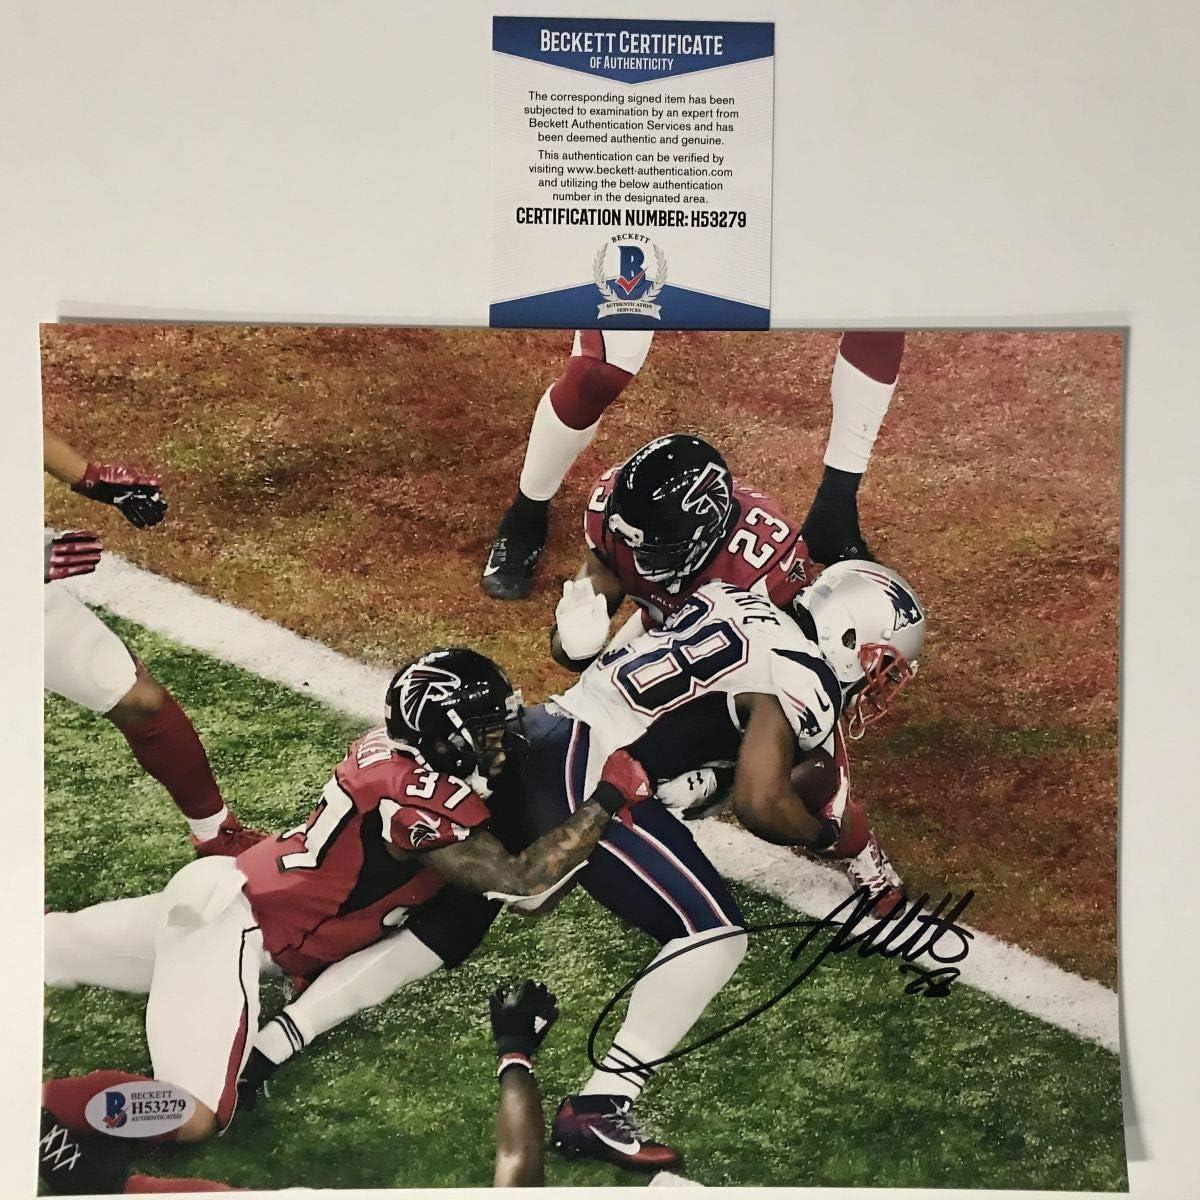 Autographed//Signed James White Super Bowl 51 GW TD New England Patriots 8x10 Football Photo Beckett BAS COA